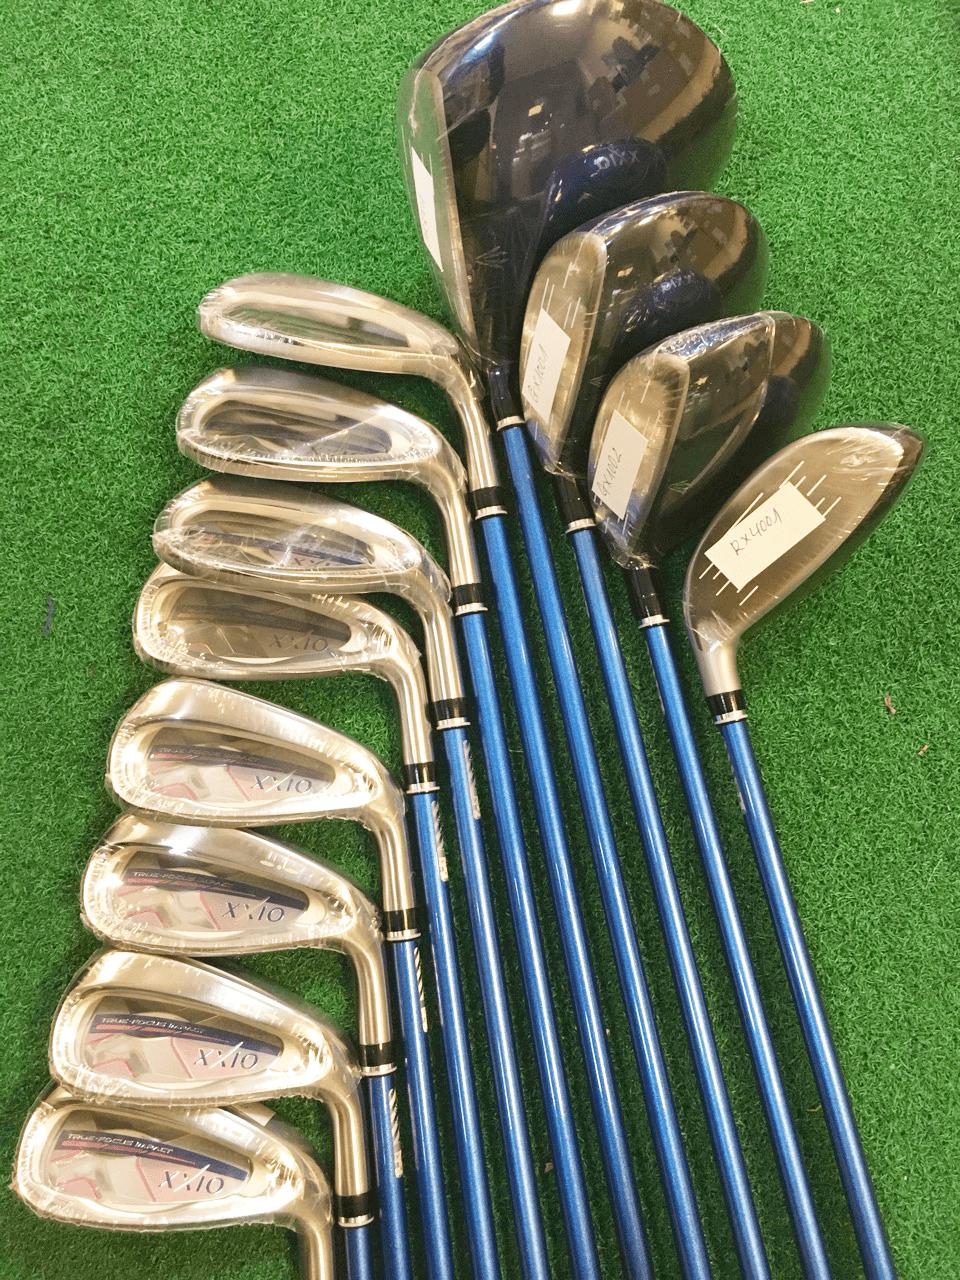 Bộ gậy golf Fullset nữ XXIO MP1000 Lady